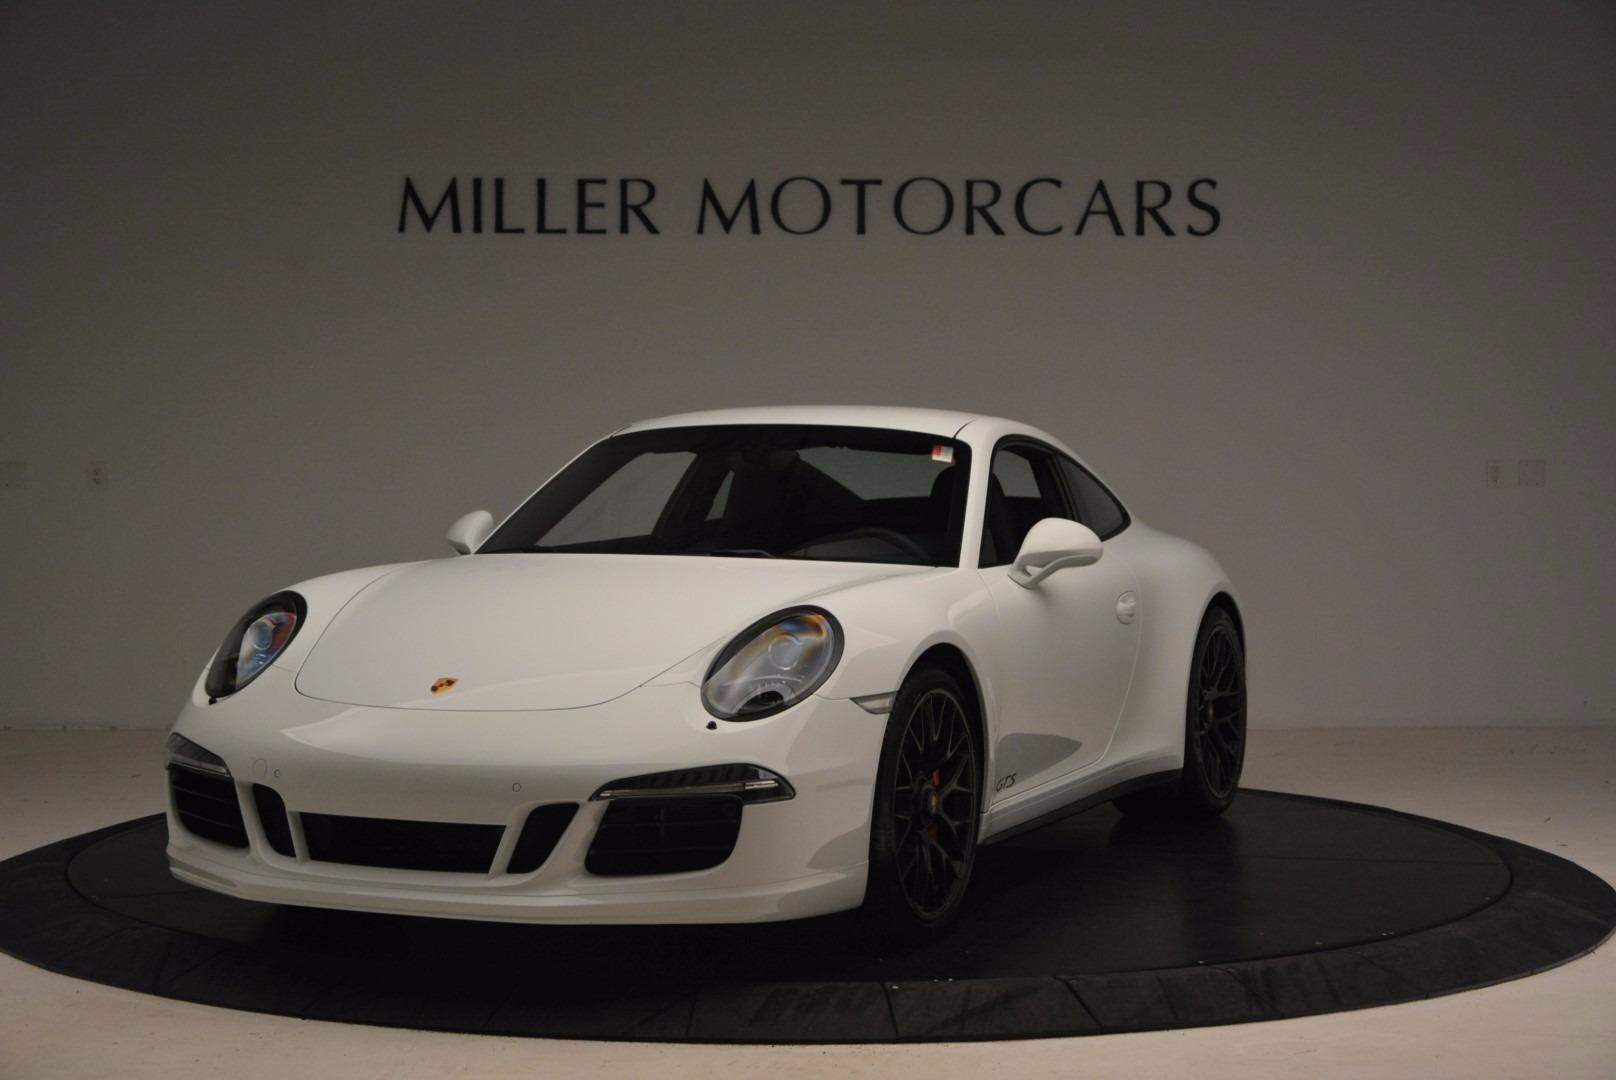 Used 2015 Porsche 911 Carrera GTS for sale Sold at Alfa Romeo of Greenwich in Greenwich CT 06830 1